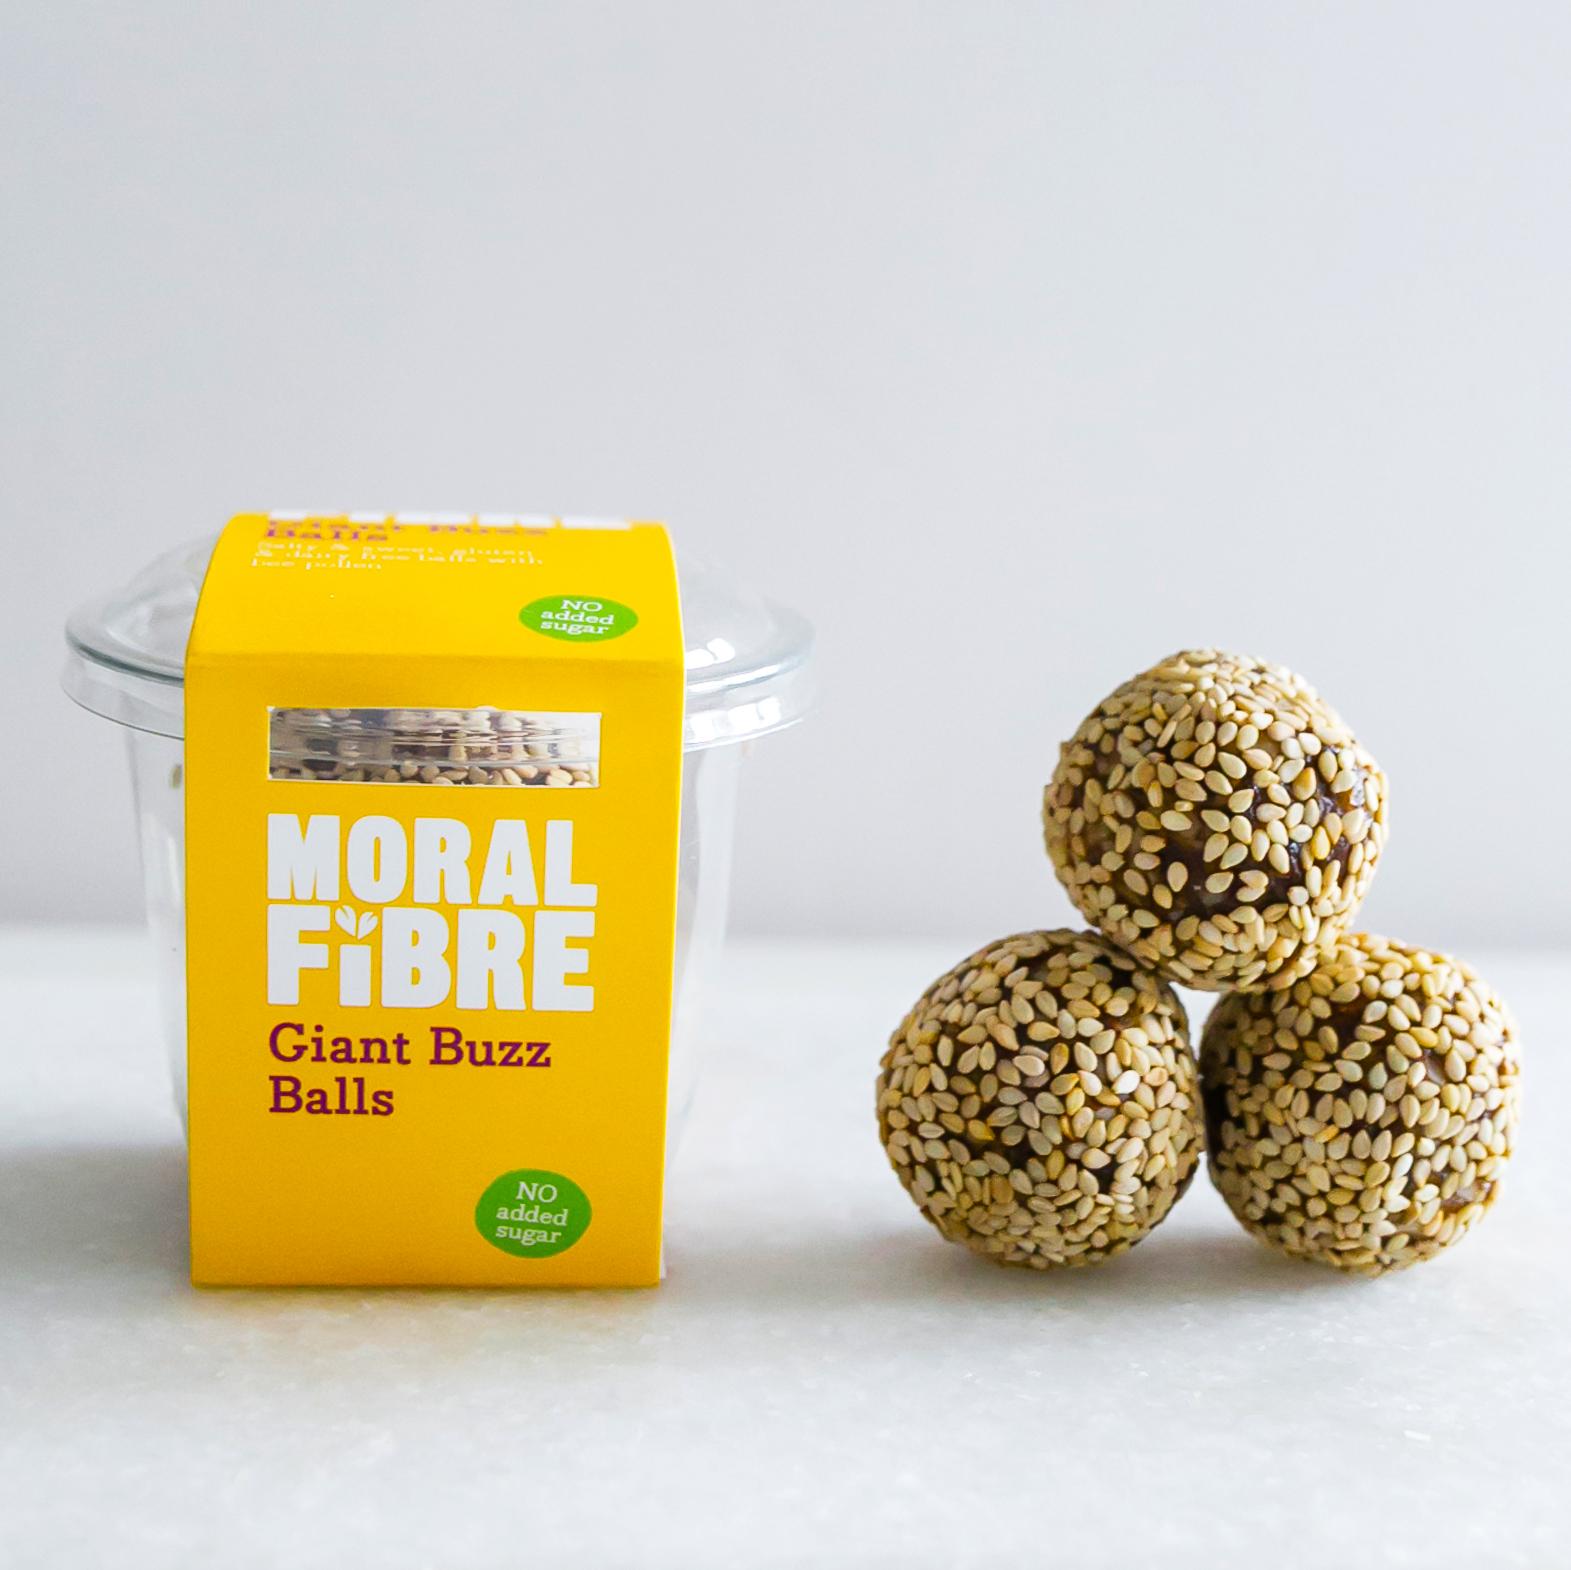 Sweet  Giant Buzz Balls (not vegan)